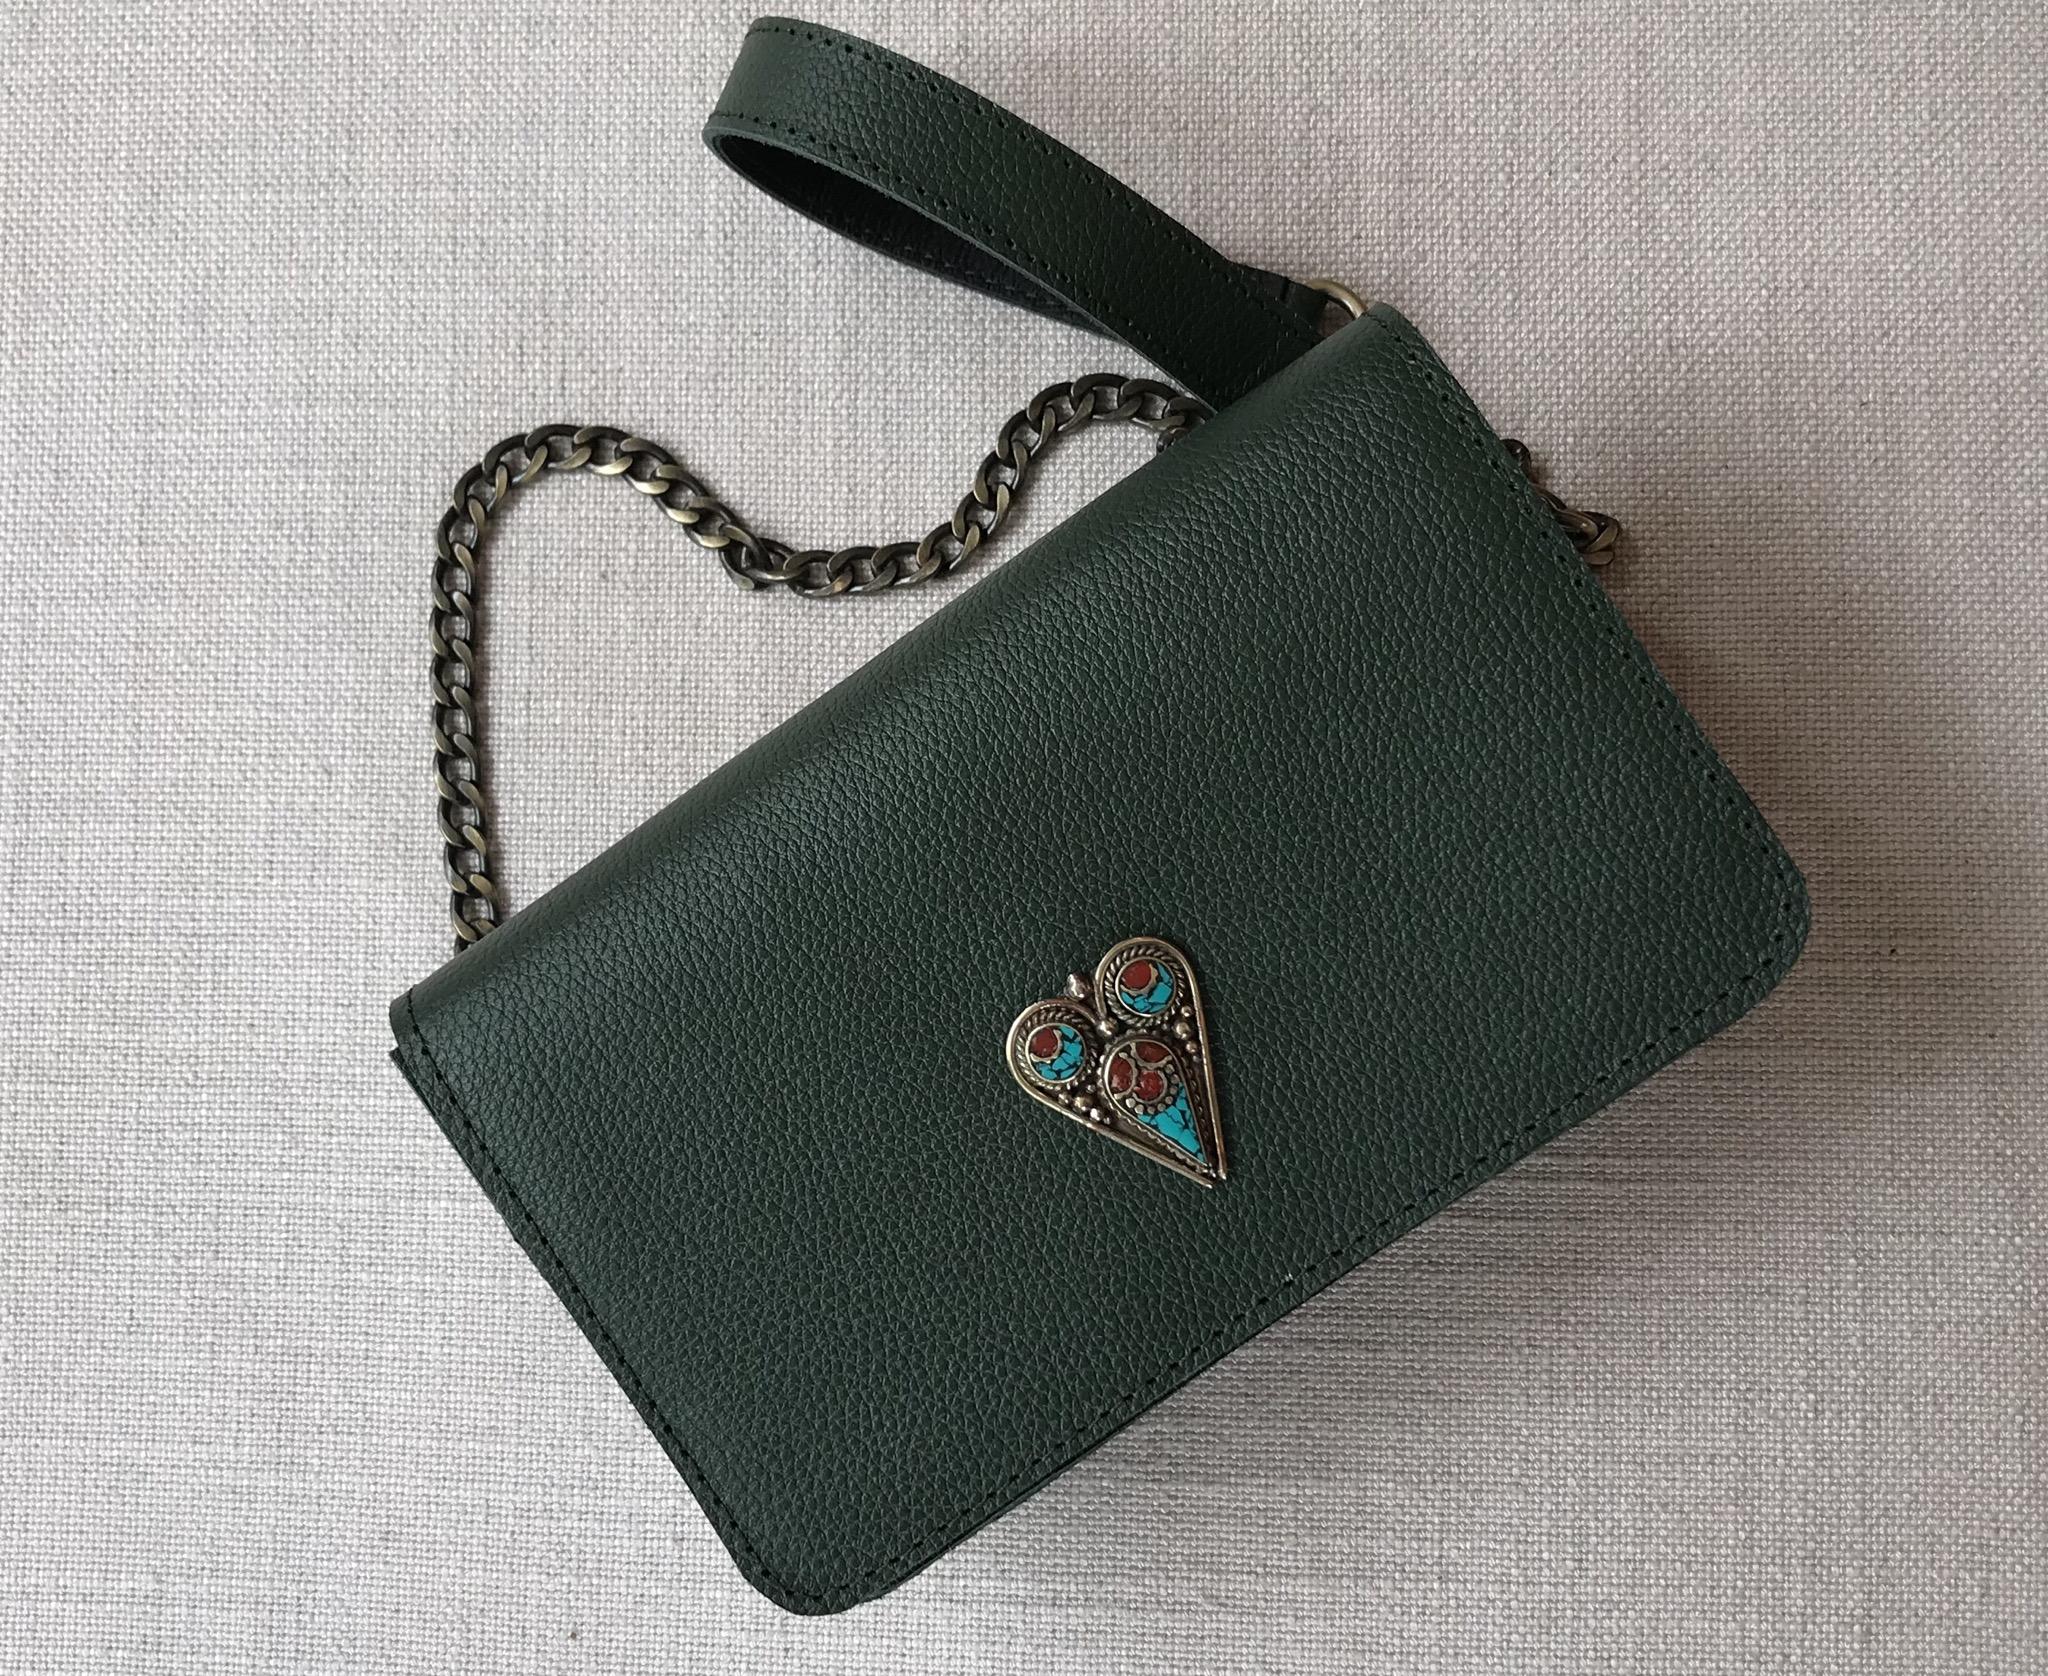 Bag mini jewelry leather green with artisanal jewelry